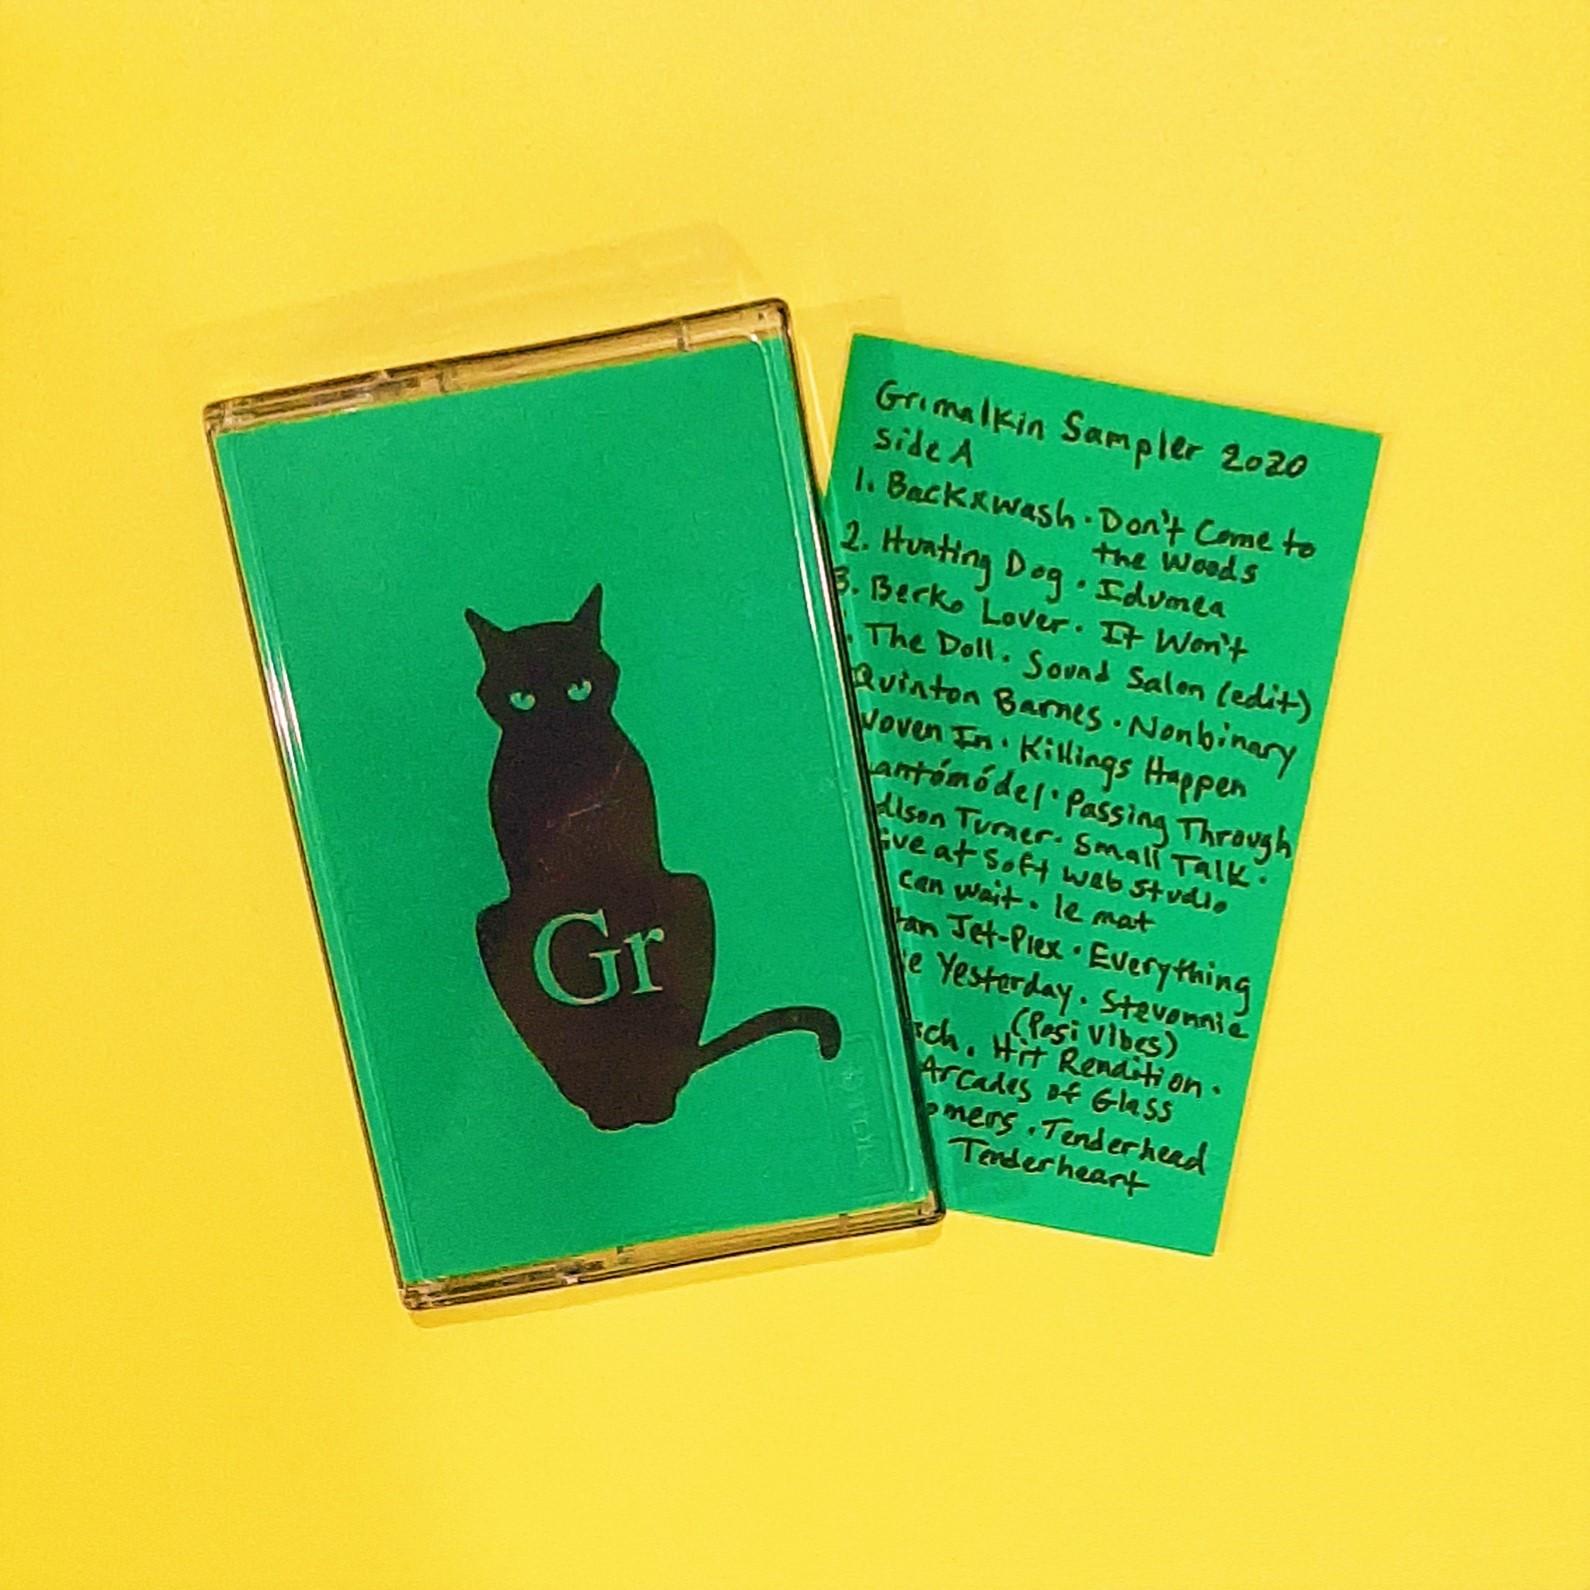 Grimalkin Sampler (Grimalkin Records)